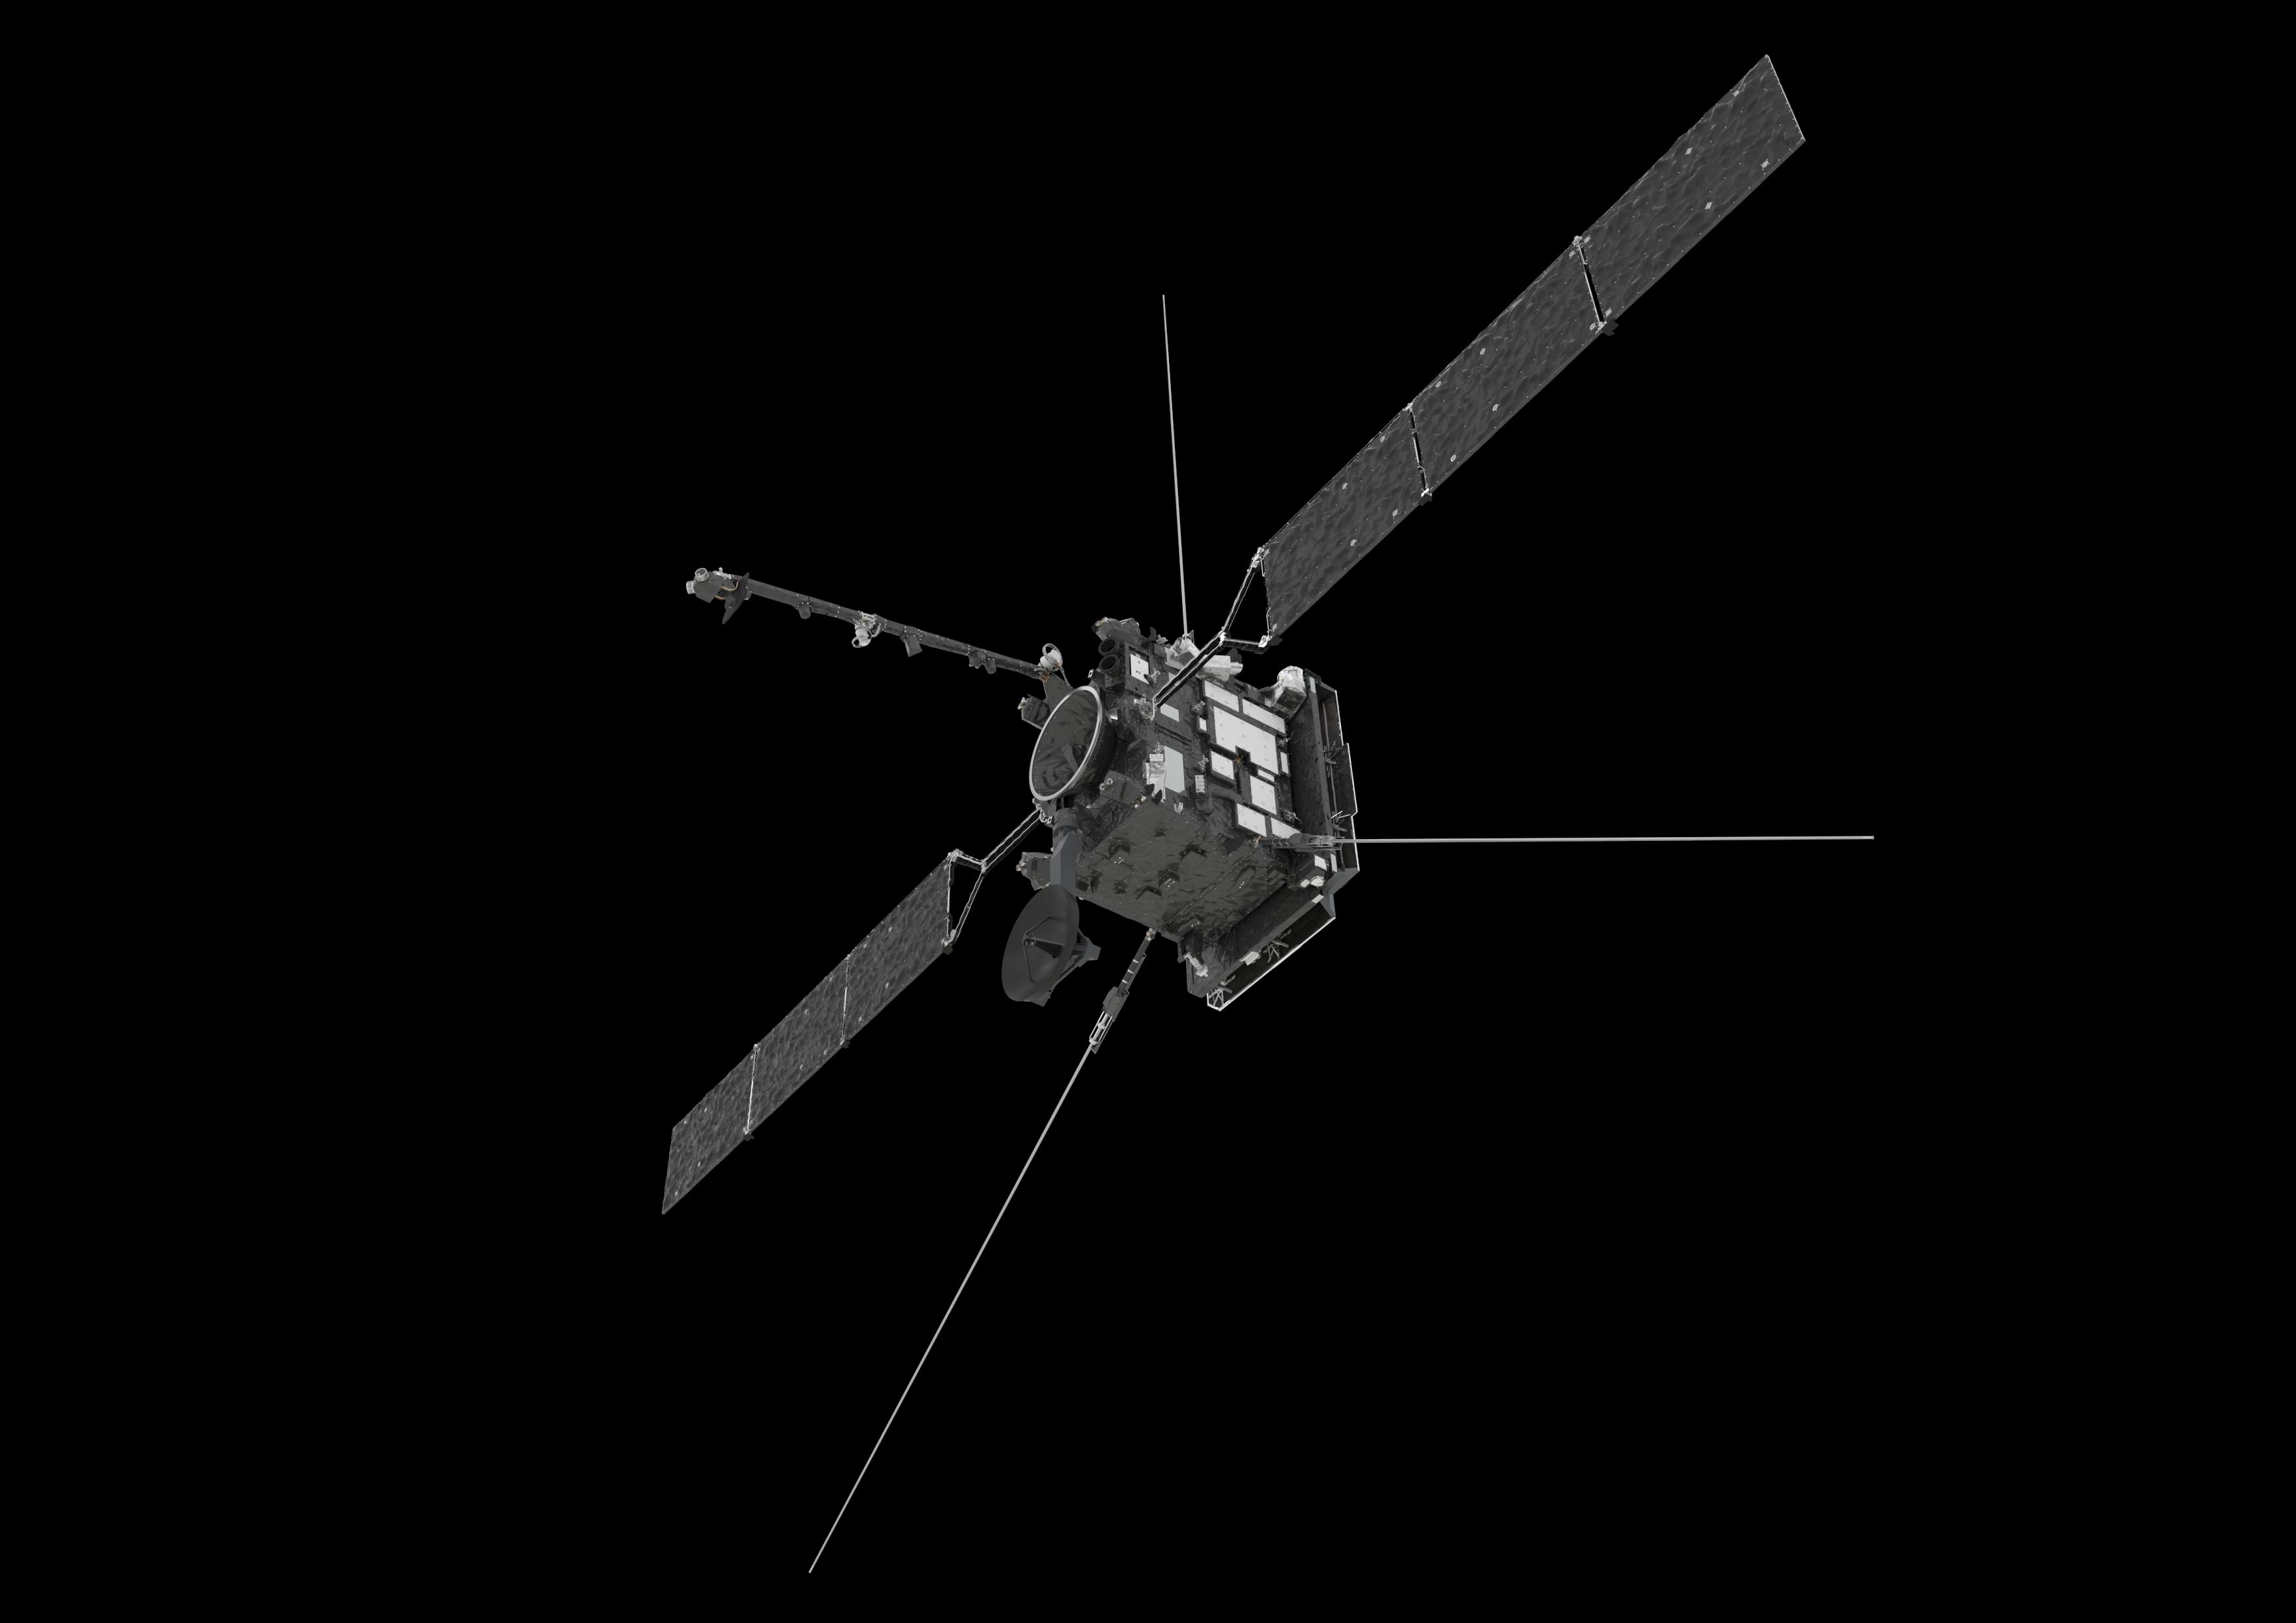 Solar_Orbiter_artist_impression_20190916_11.png